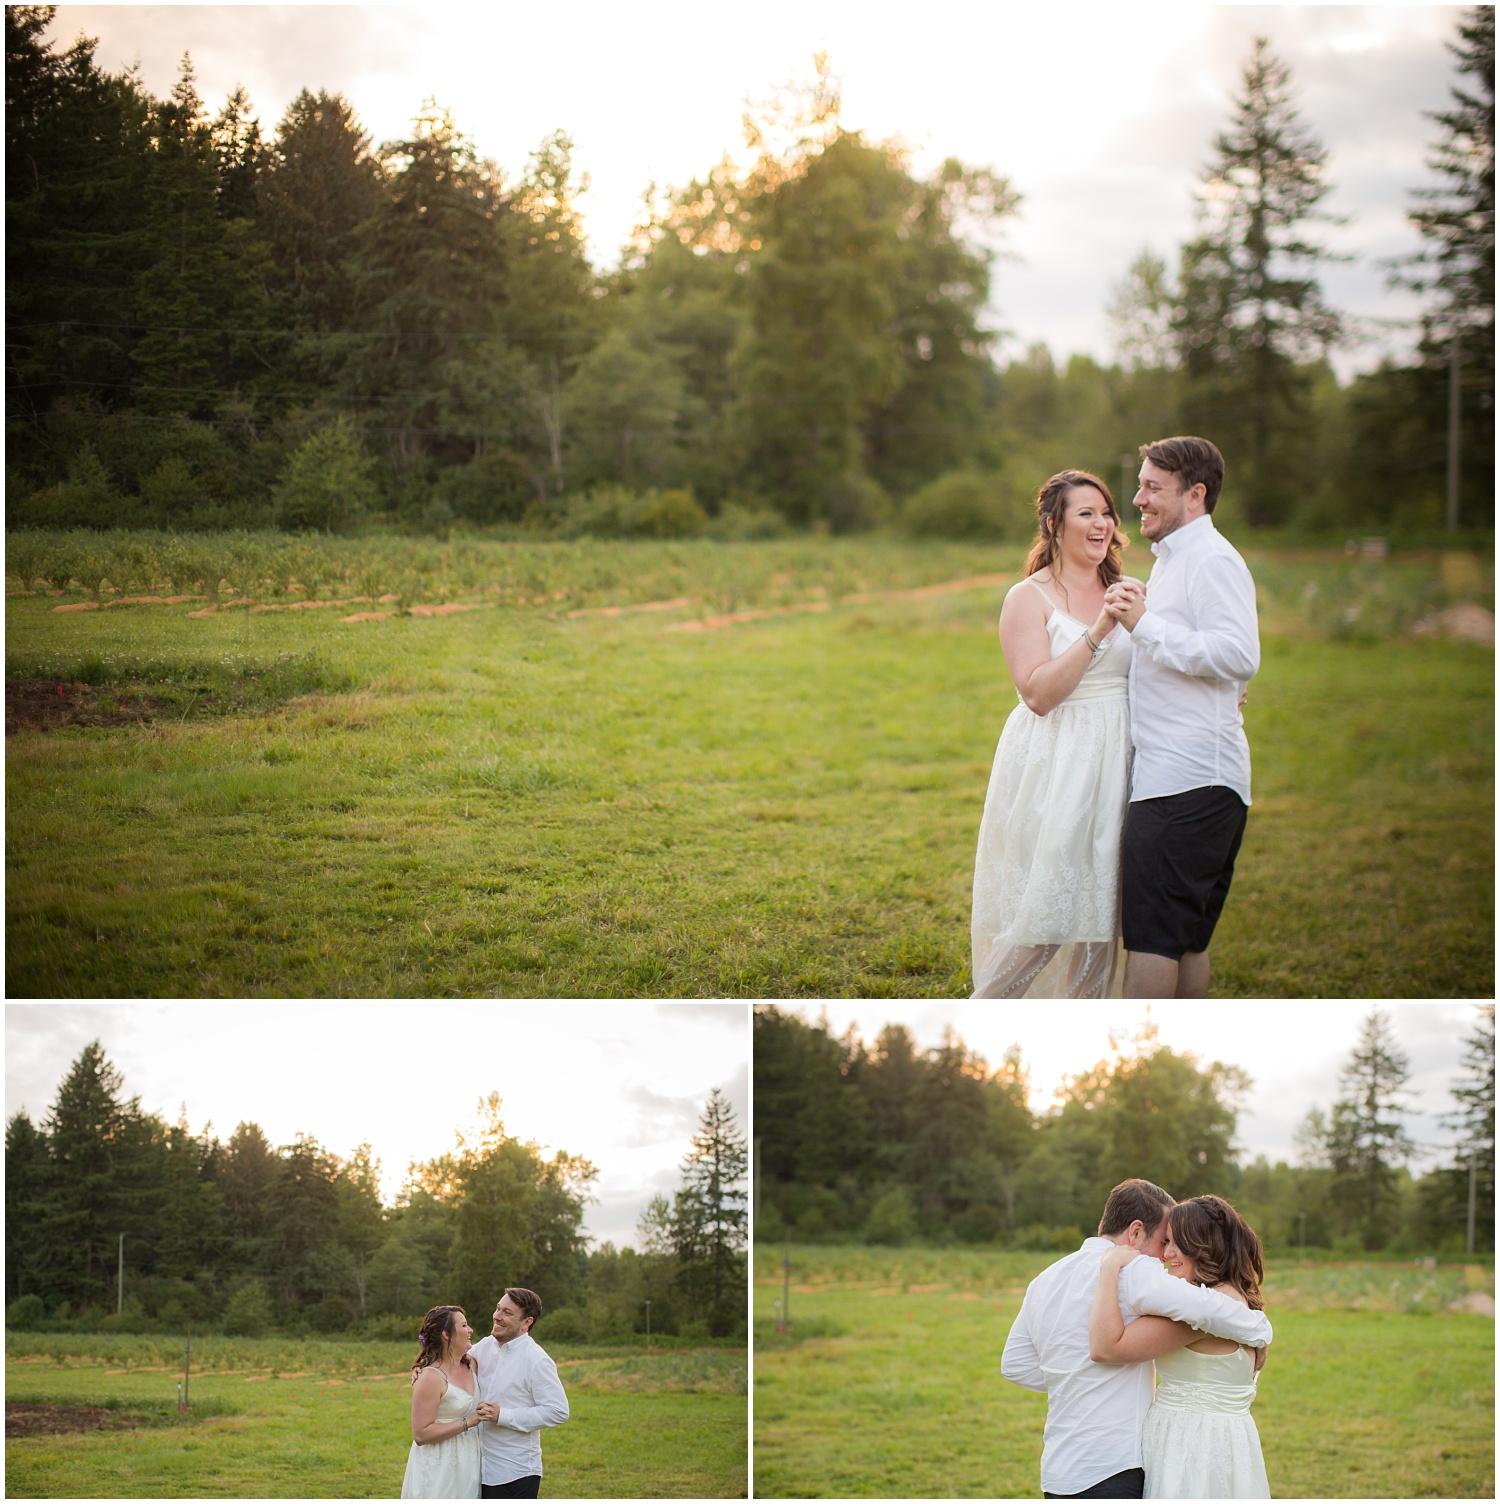 Amazing Day Photography - Courtney Wedding Photographer - Farm Wedding - Backyard Wedding - Langley Wedding Photographer (12).jpg